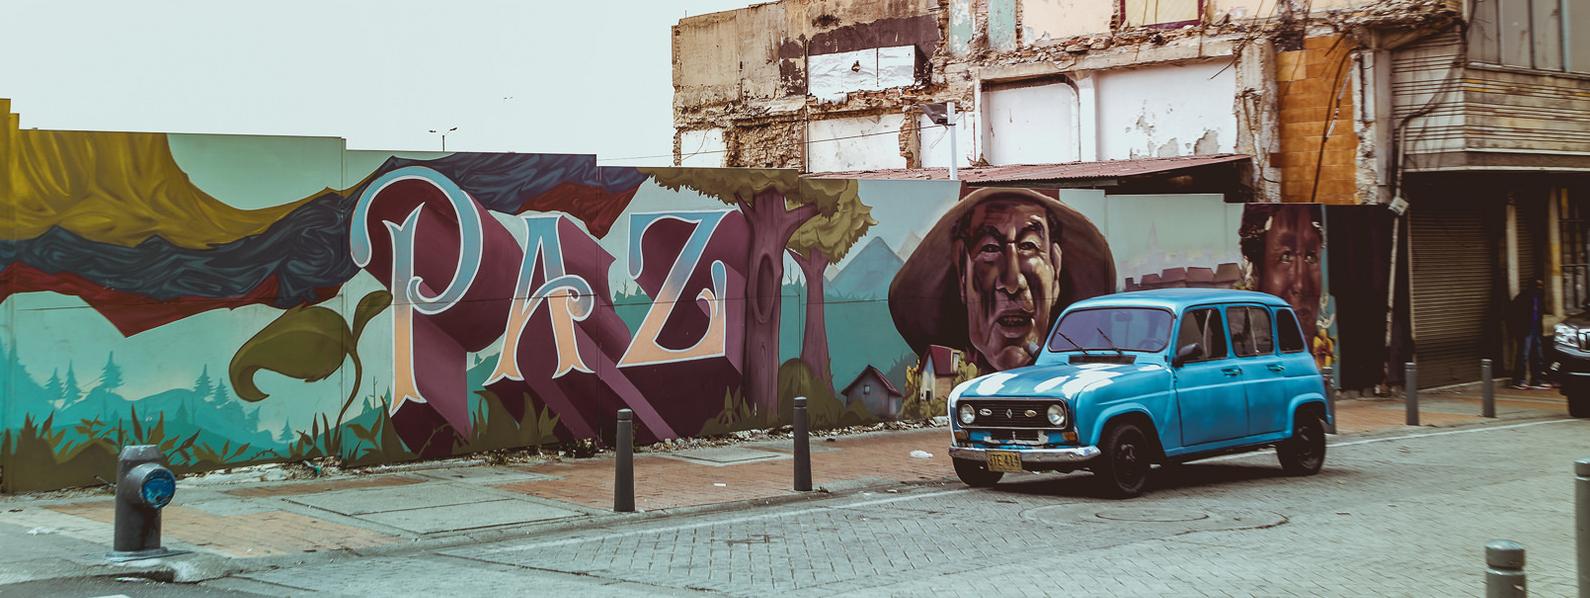 Hip Hop en Colombia  una historia que no se termina de contar 15d8b55e609